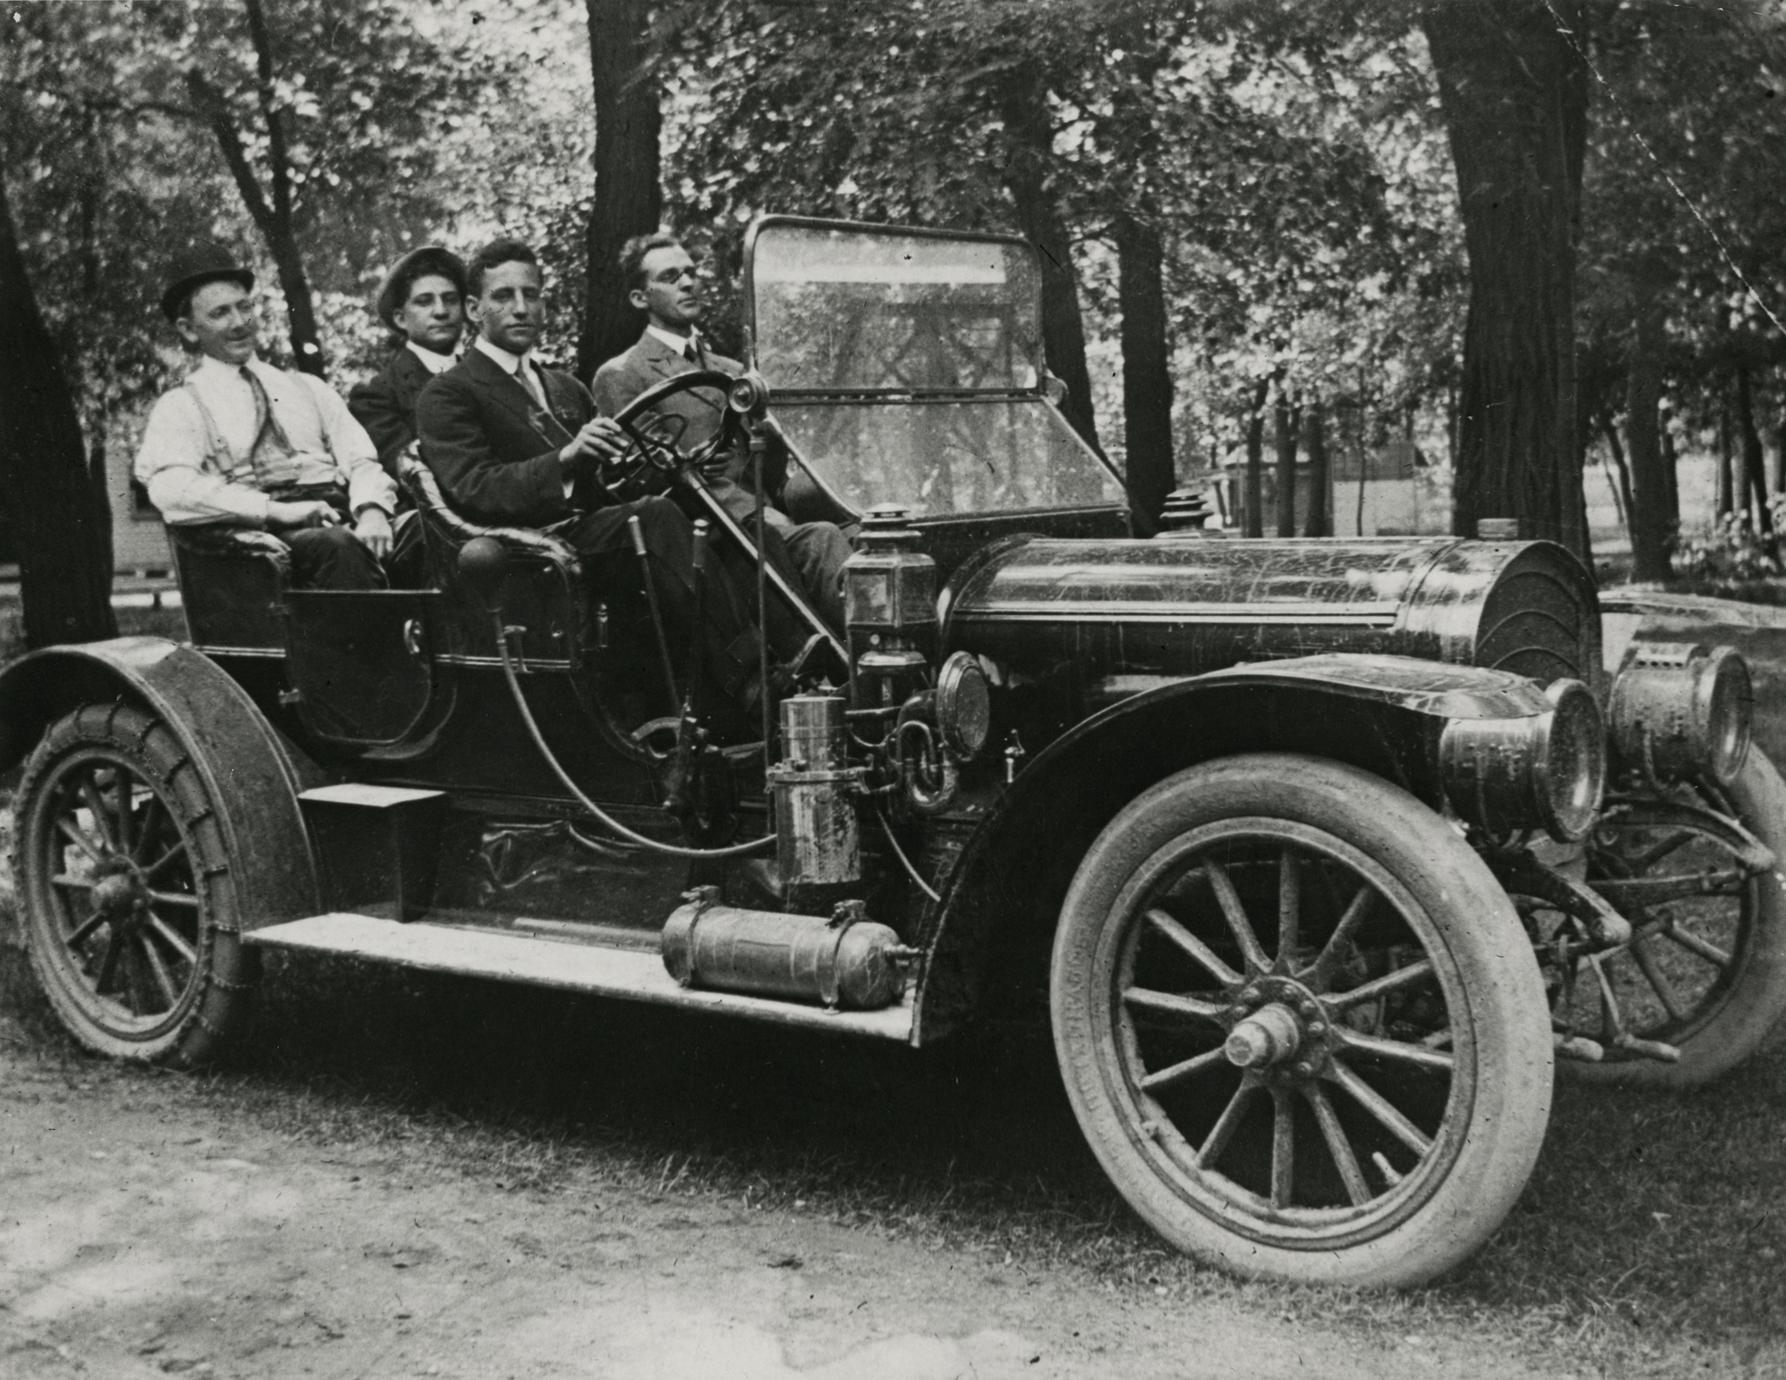 A 1909 Jeffery Rambler